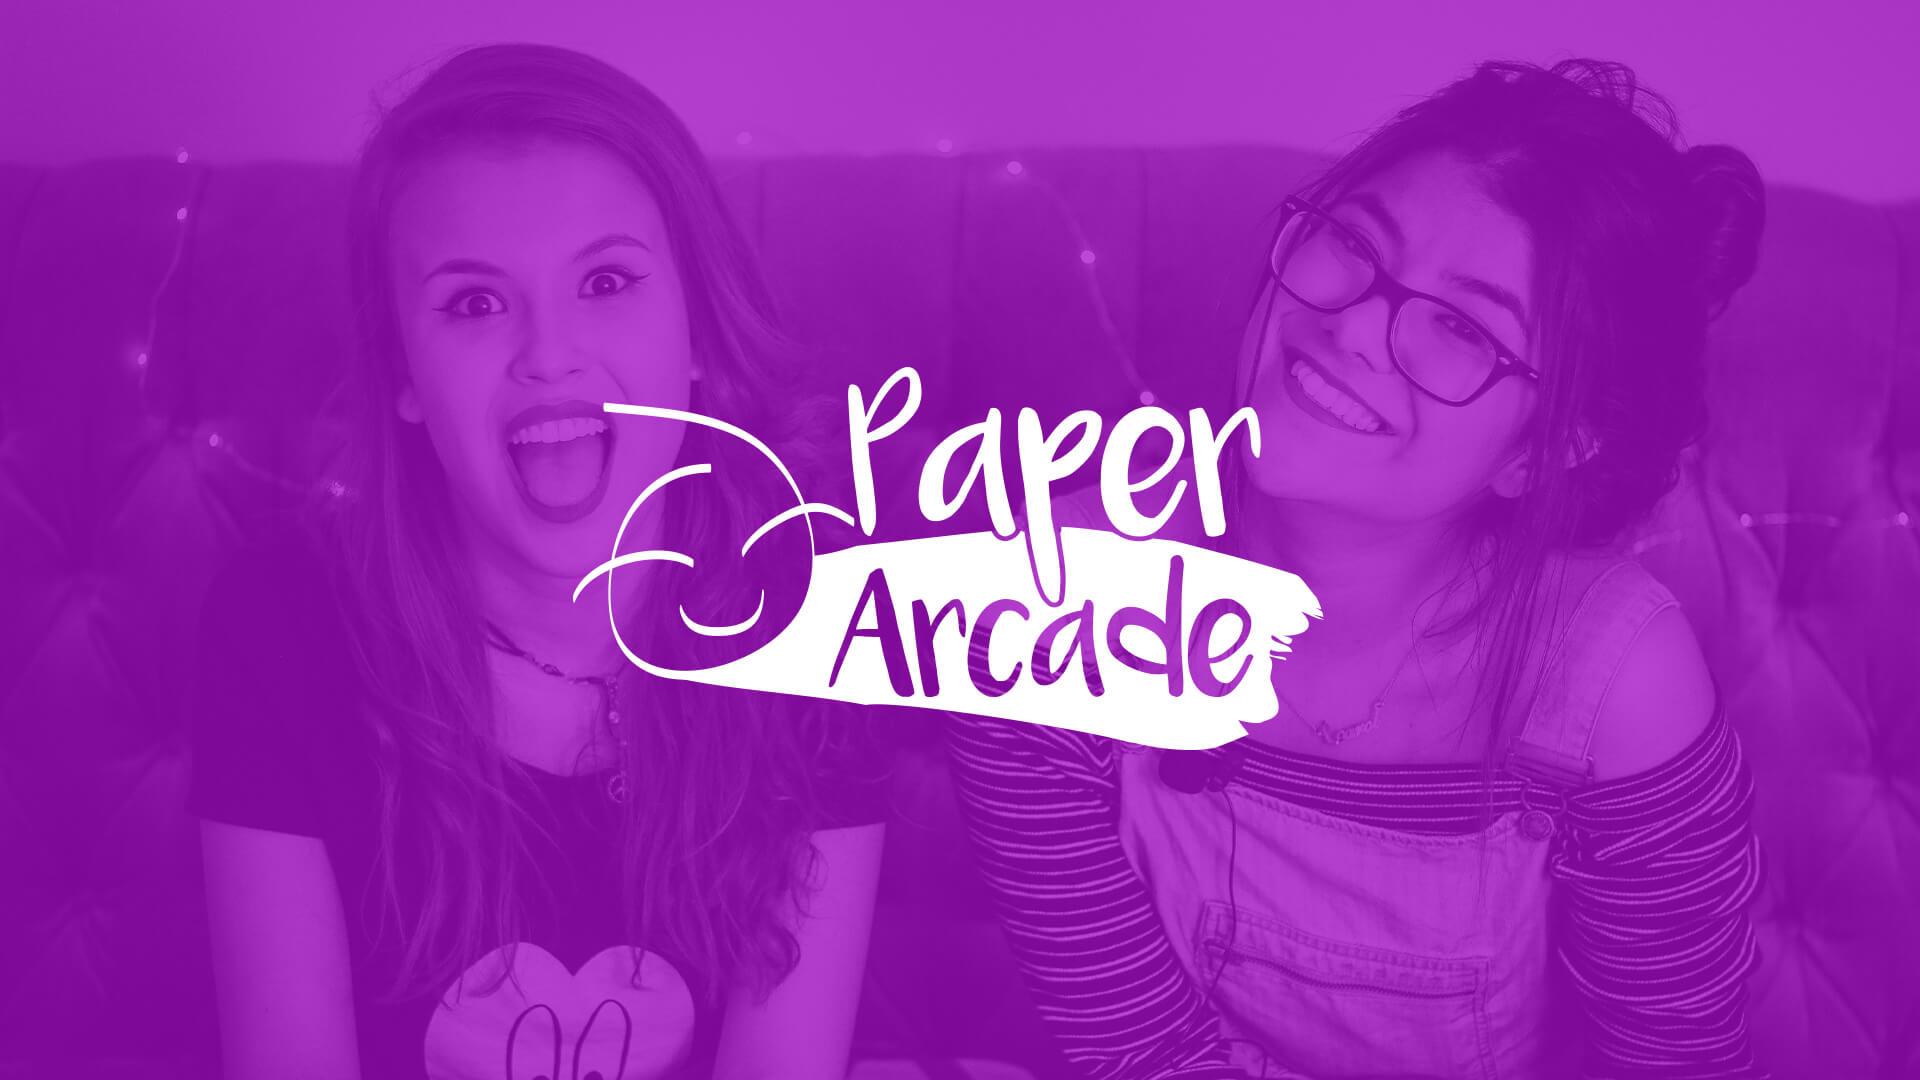 Paper Arcade Banner | Voltekka: Website Design & Digital Marketing Specialists